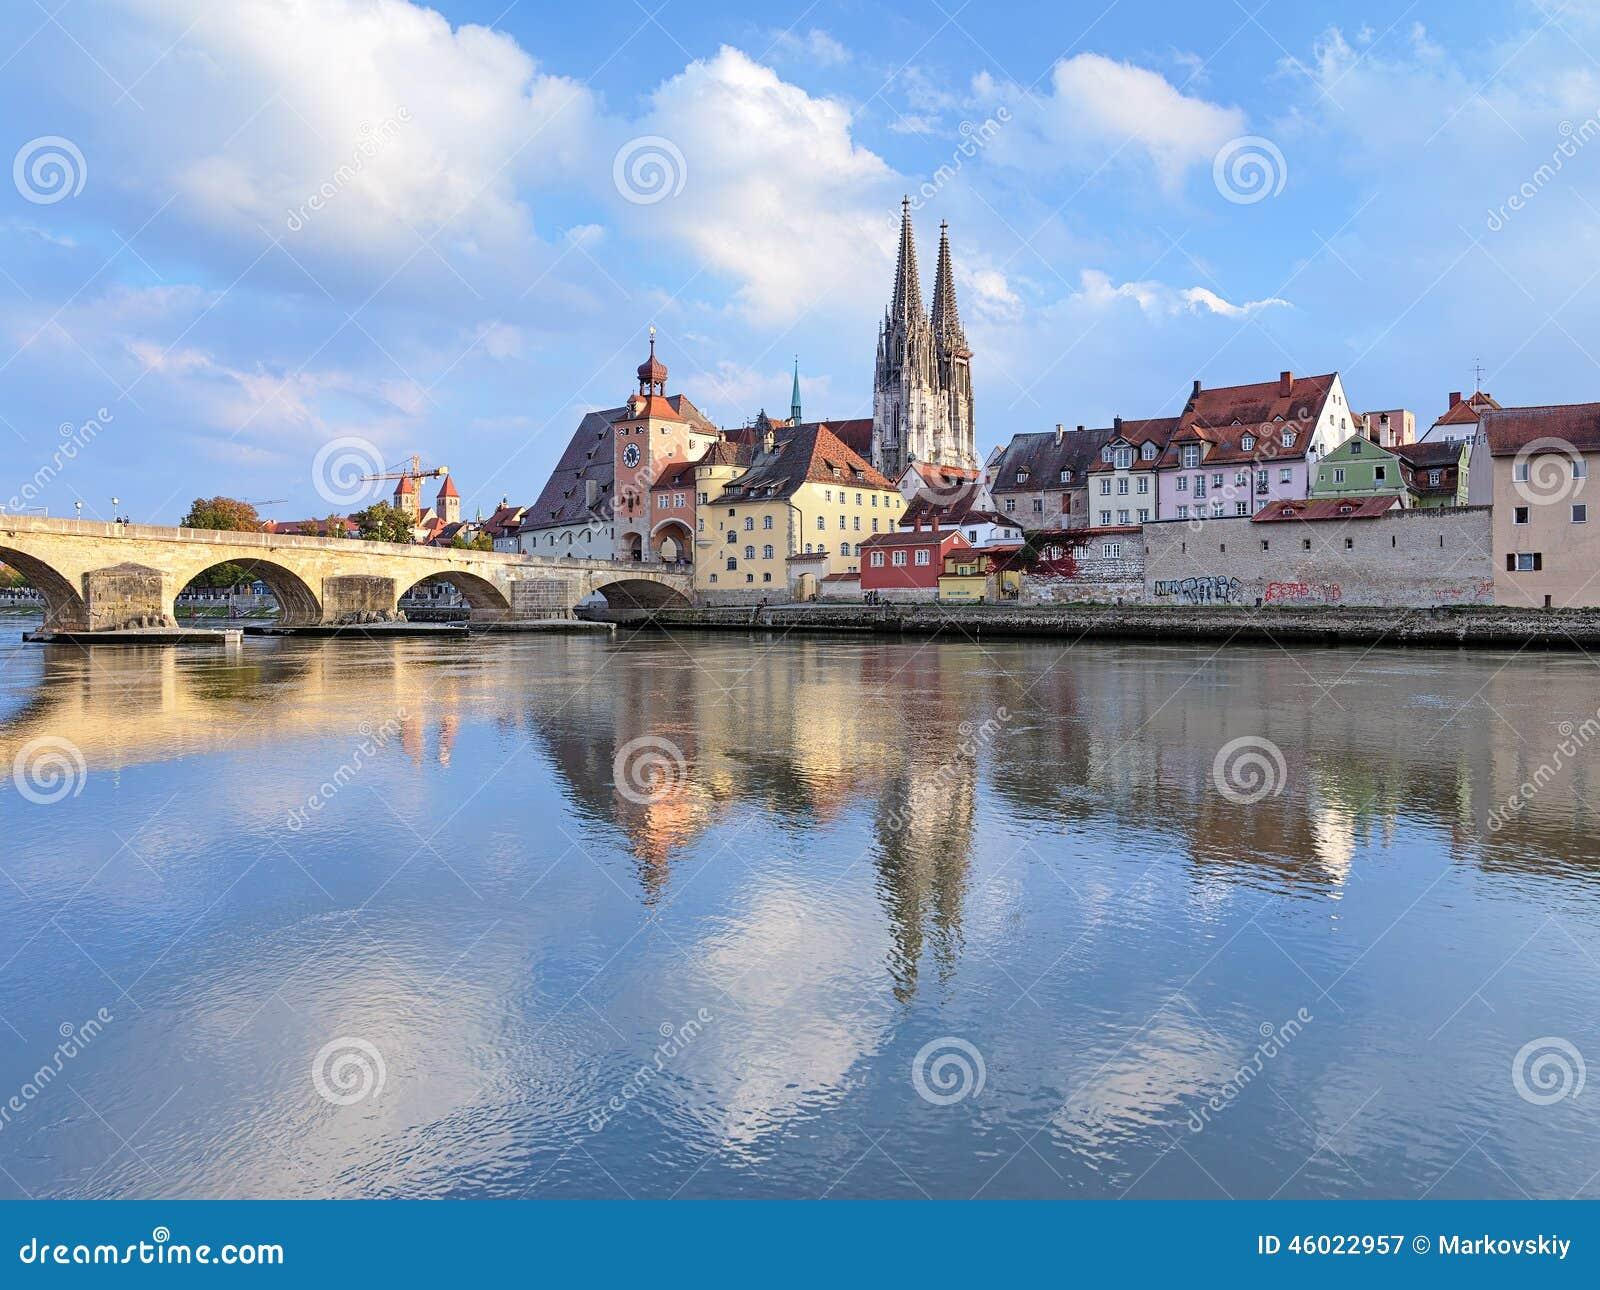 Regensburg cathedral and stone bridge in regensburg germany stock